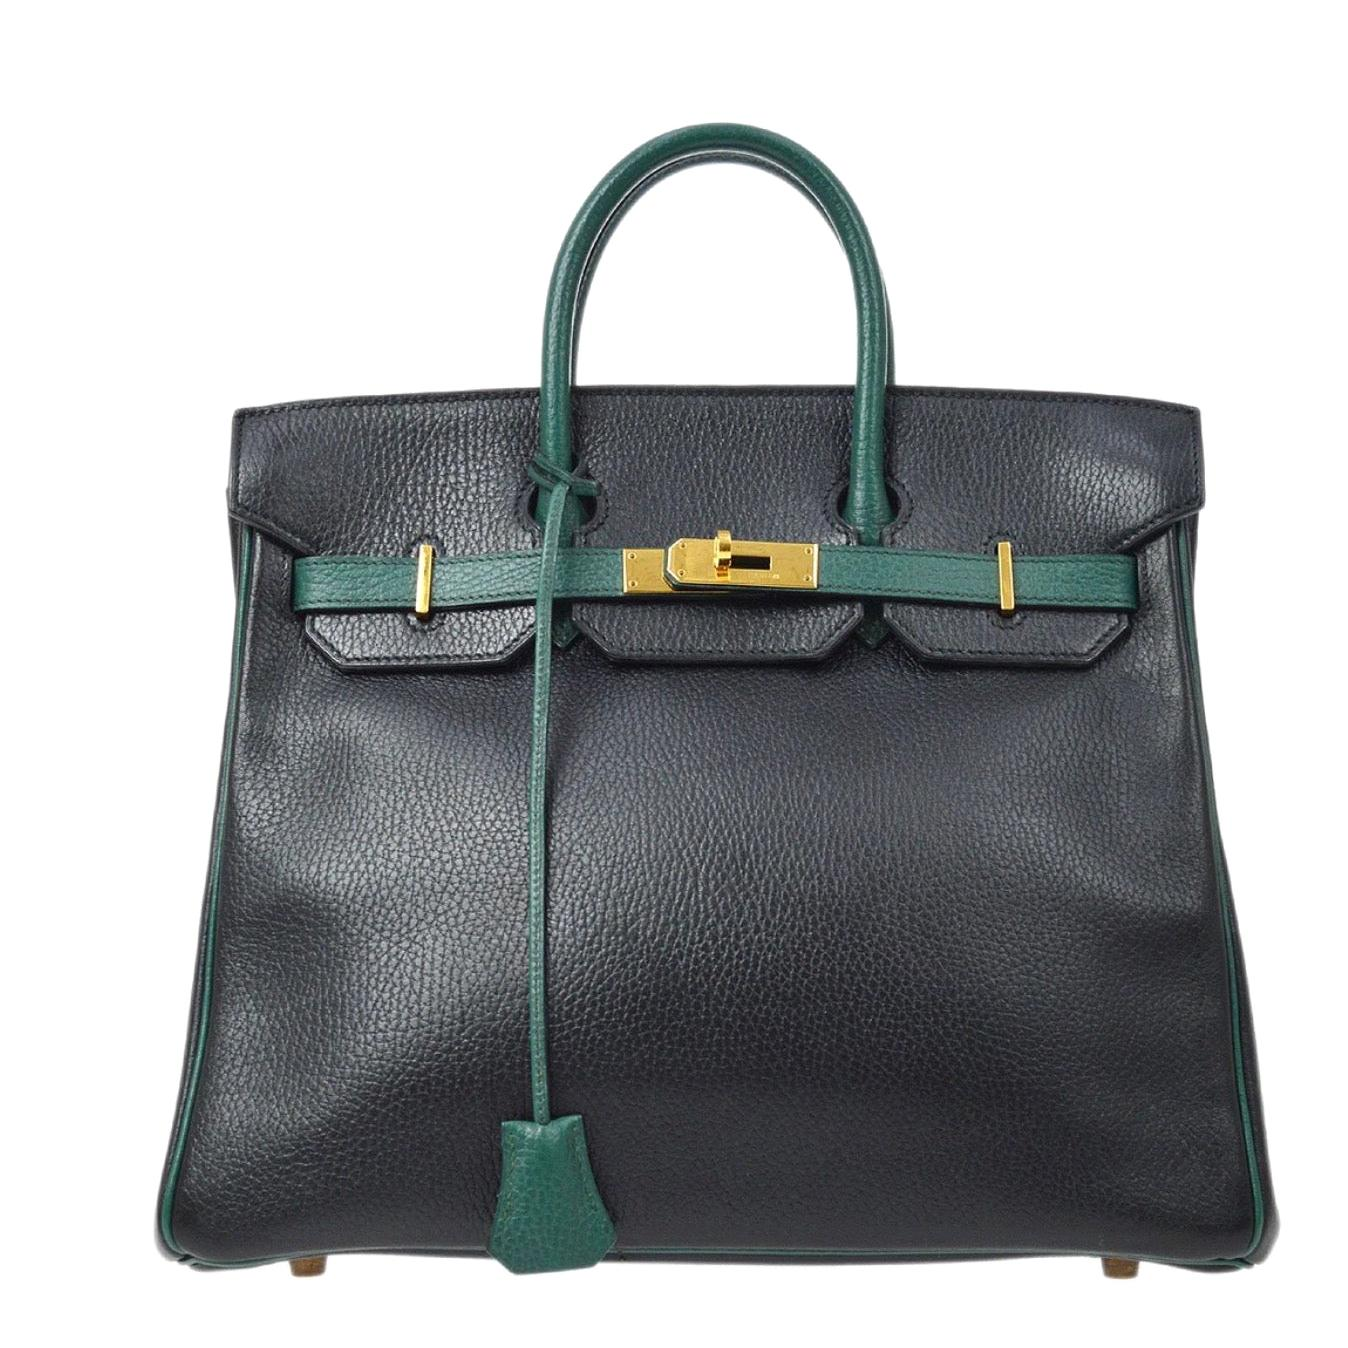 Hermes Birkin HAC 32 Black Green Gold Carryall Men's Travel Top Handle Tote Bag